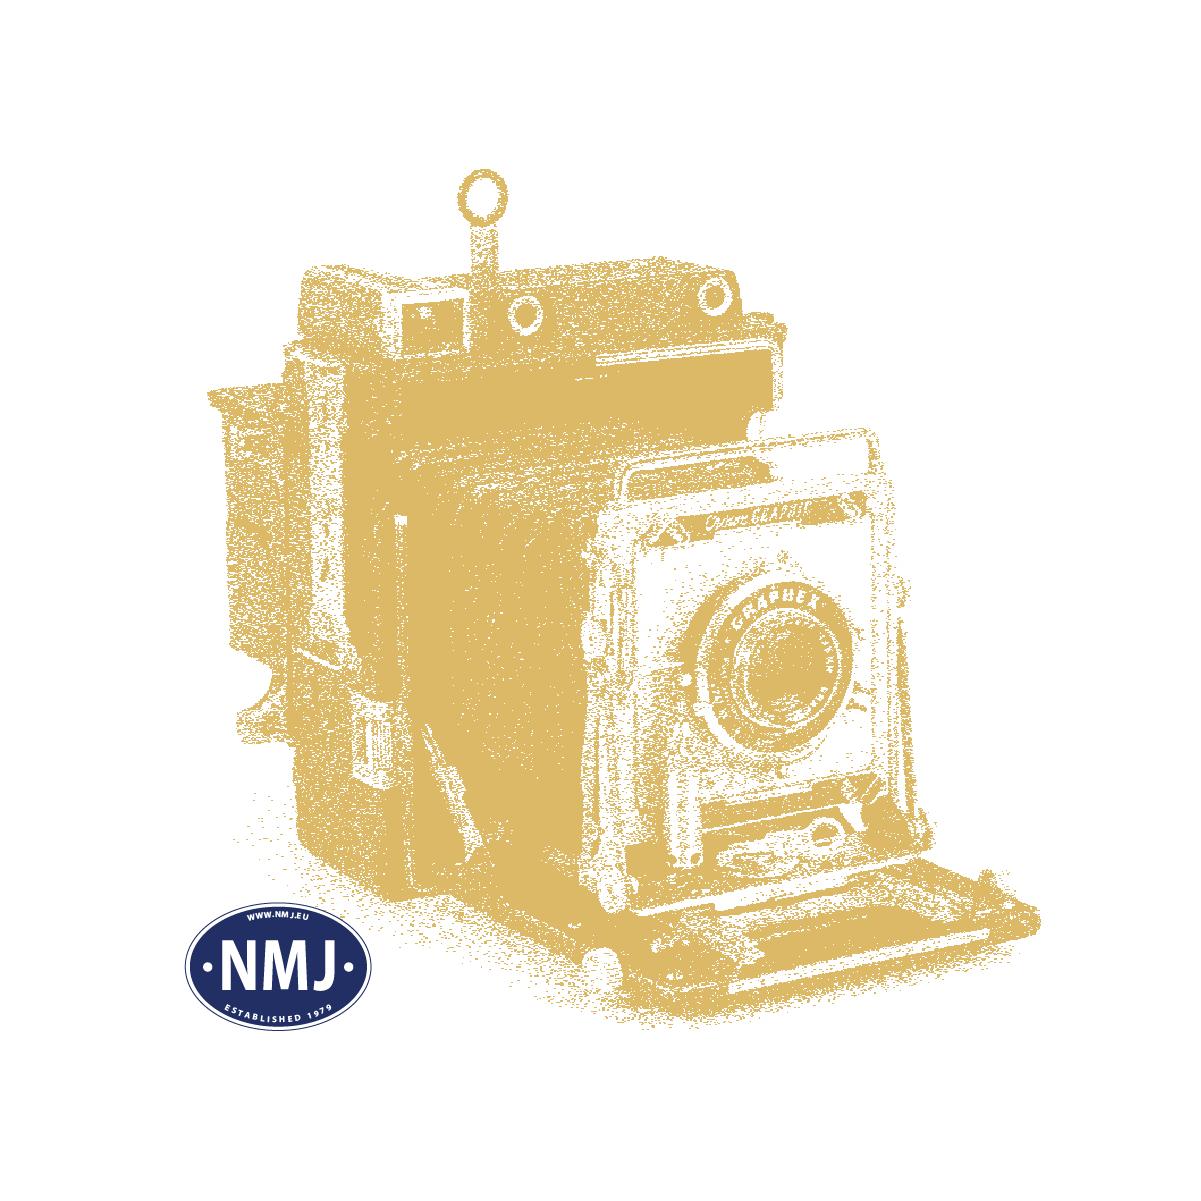 NMJT90301 - NMJ Topline CFL 1602, DCC Sound